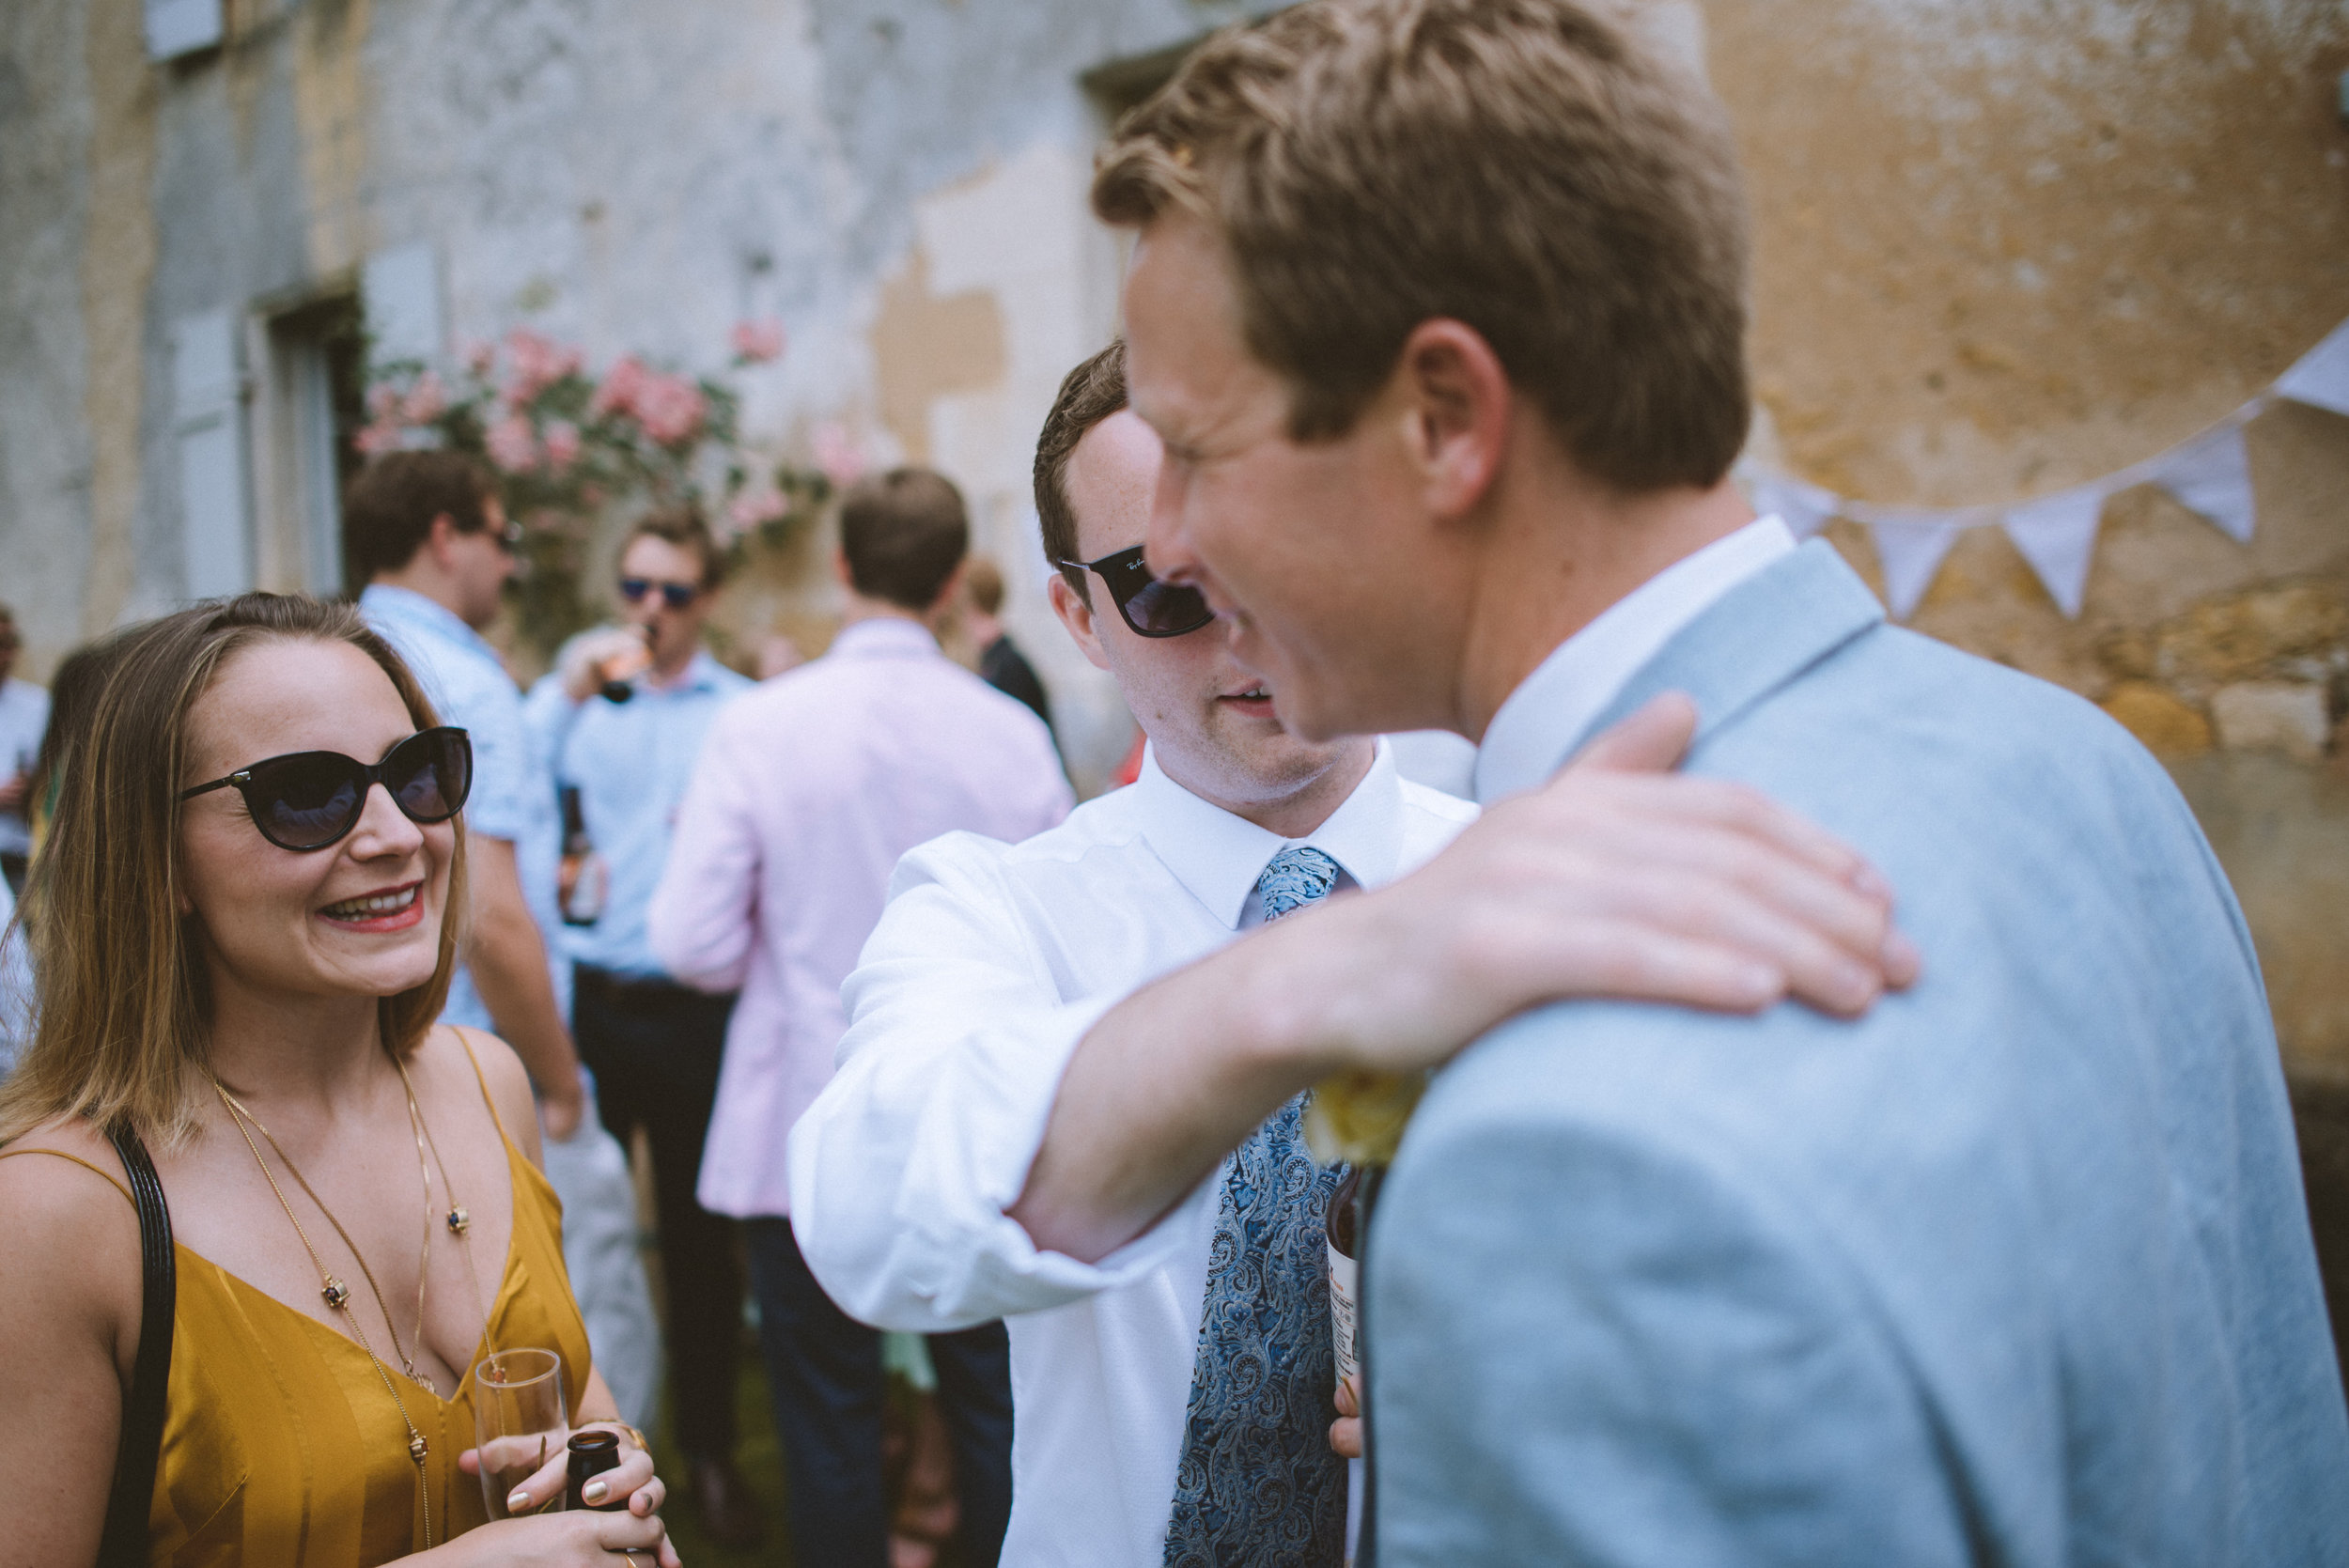 wedding-photographer-dordogne-mark-shaw-23.jpg